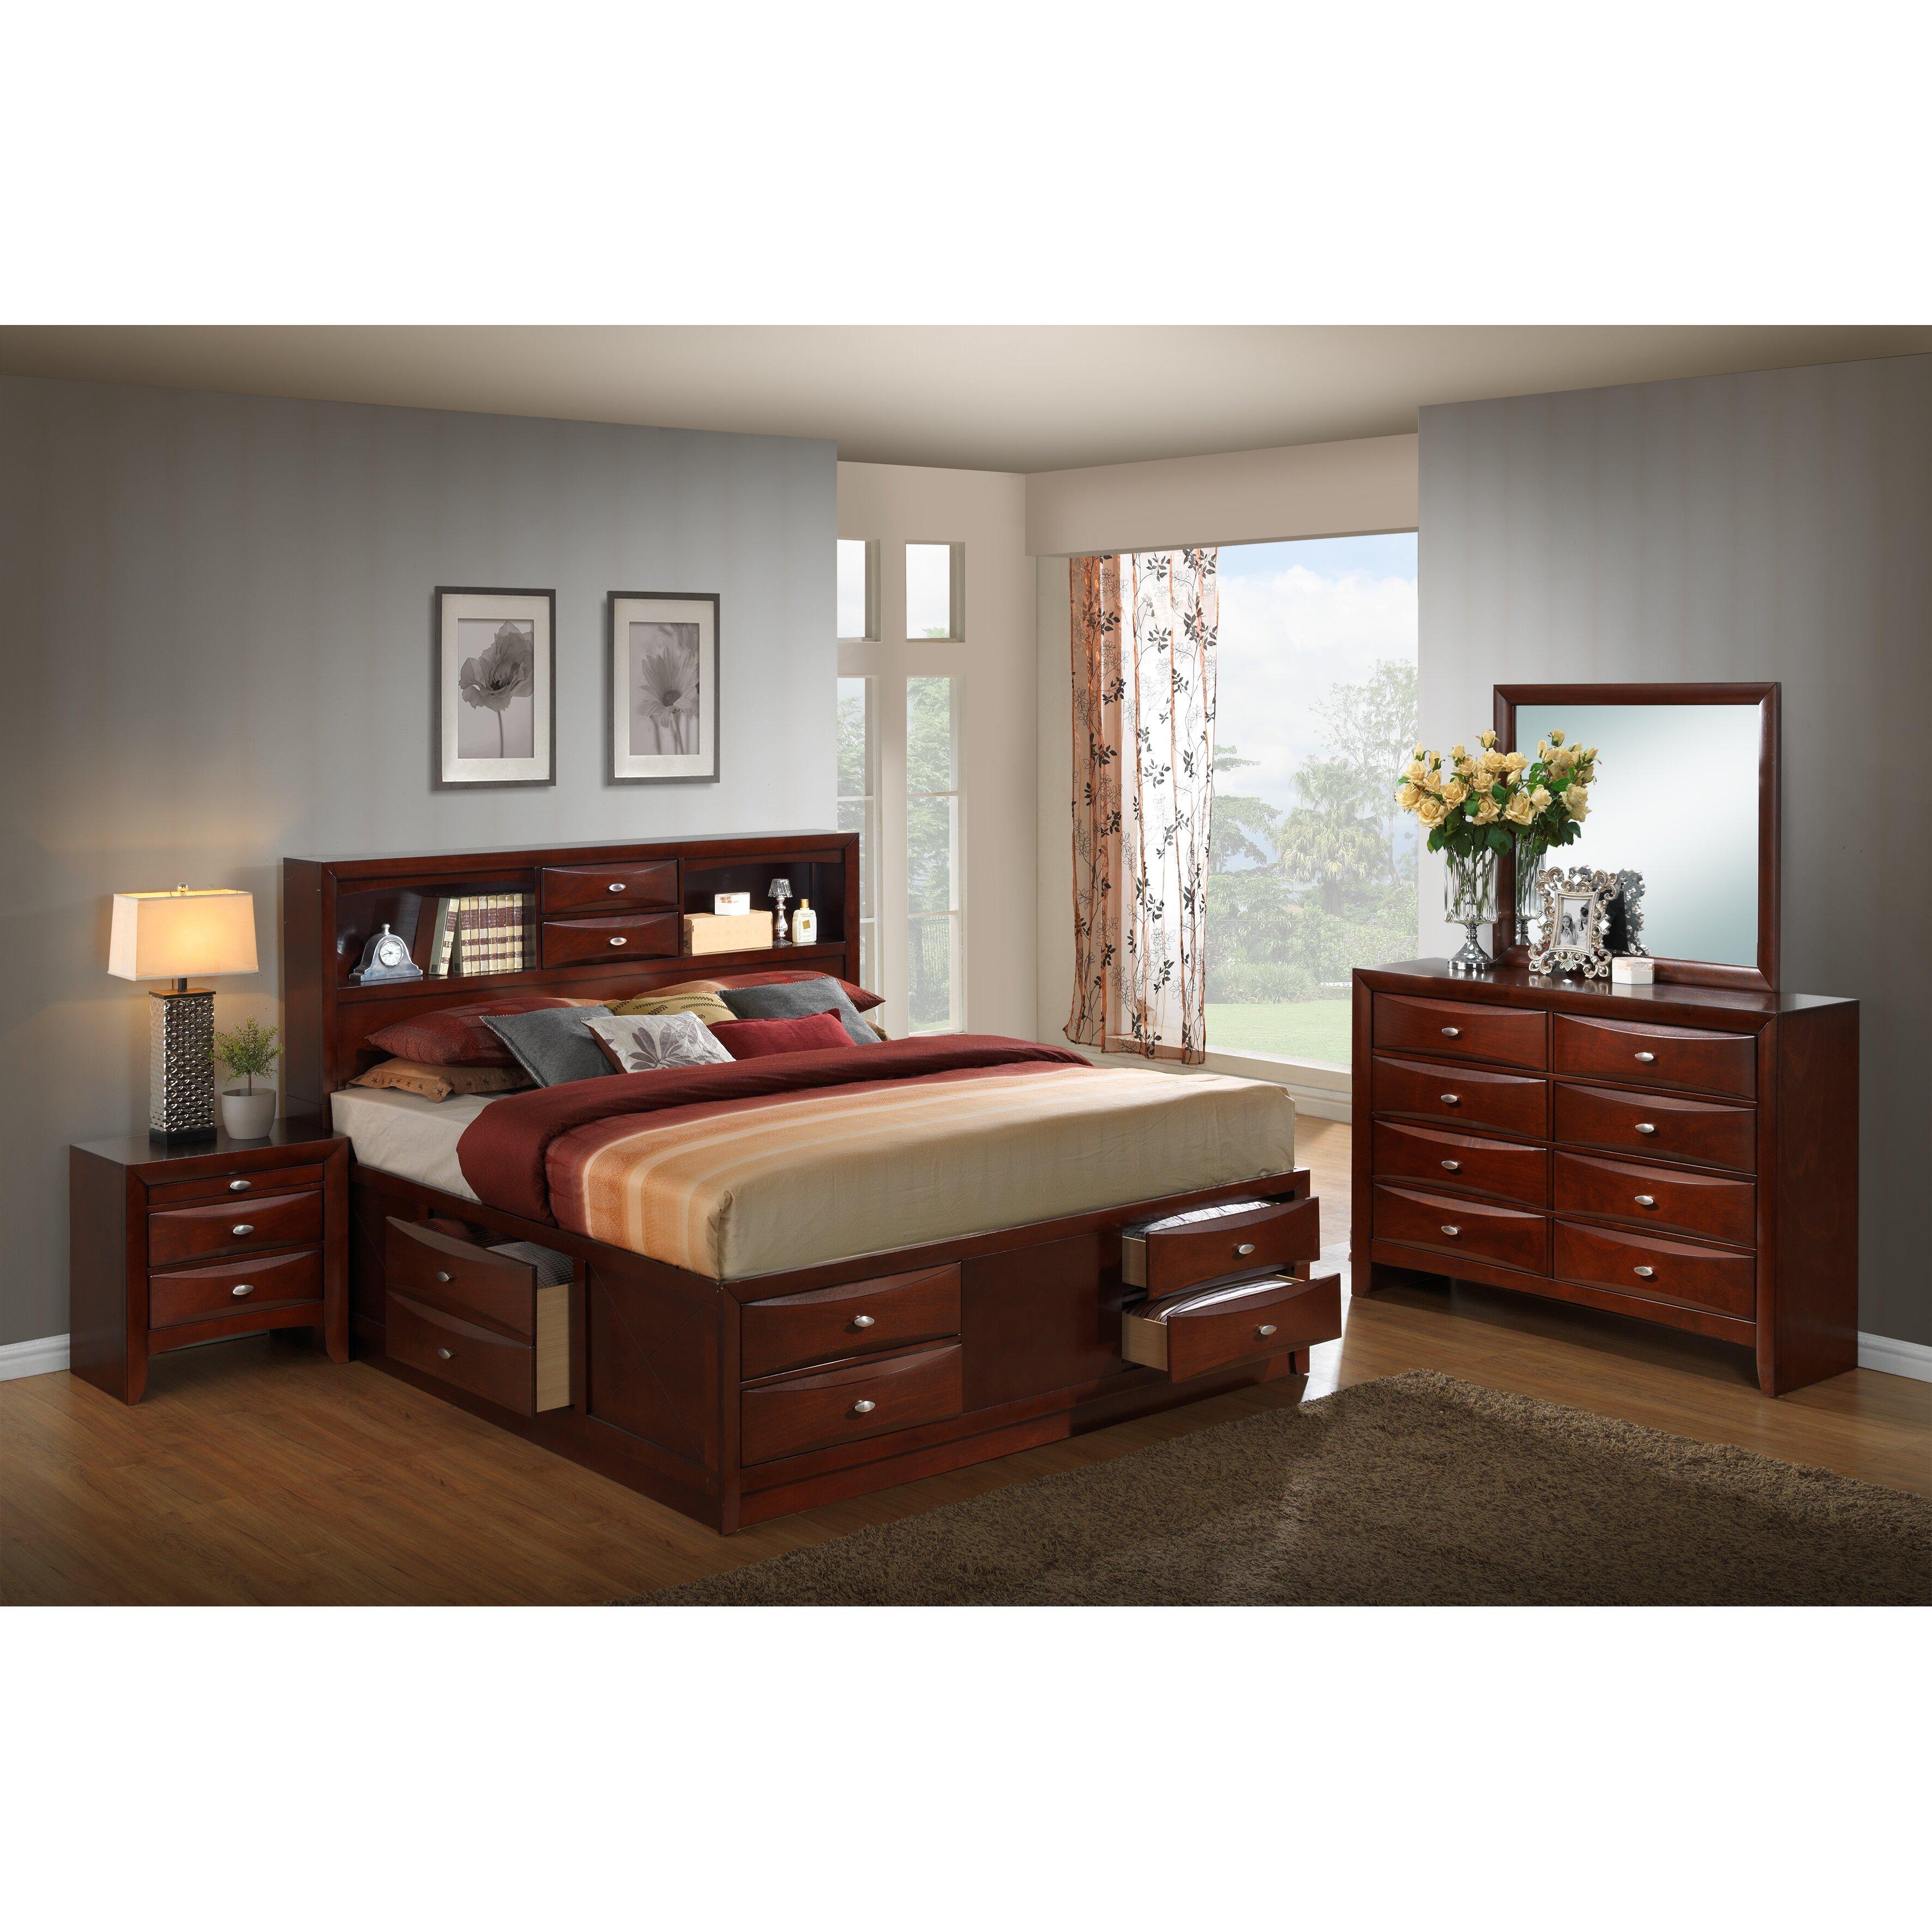 emily storage 4 piece bedroom set wayfair roundhill furniture emily storage 5 piece bedroom set